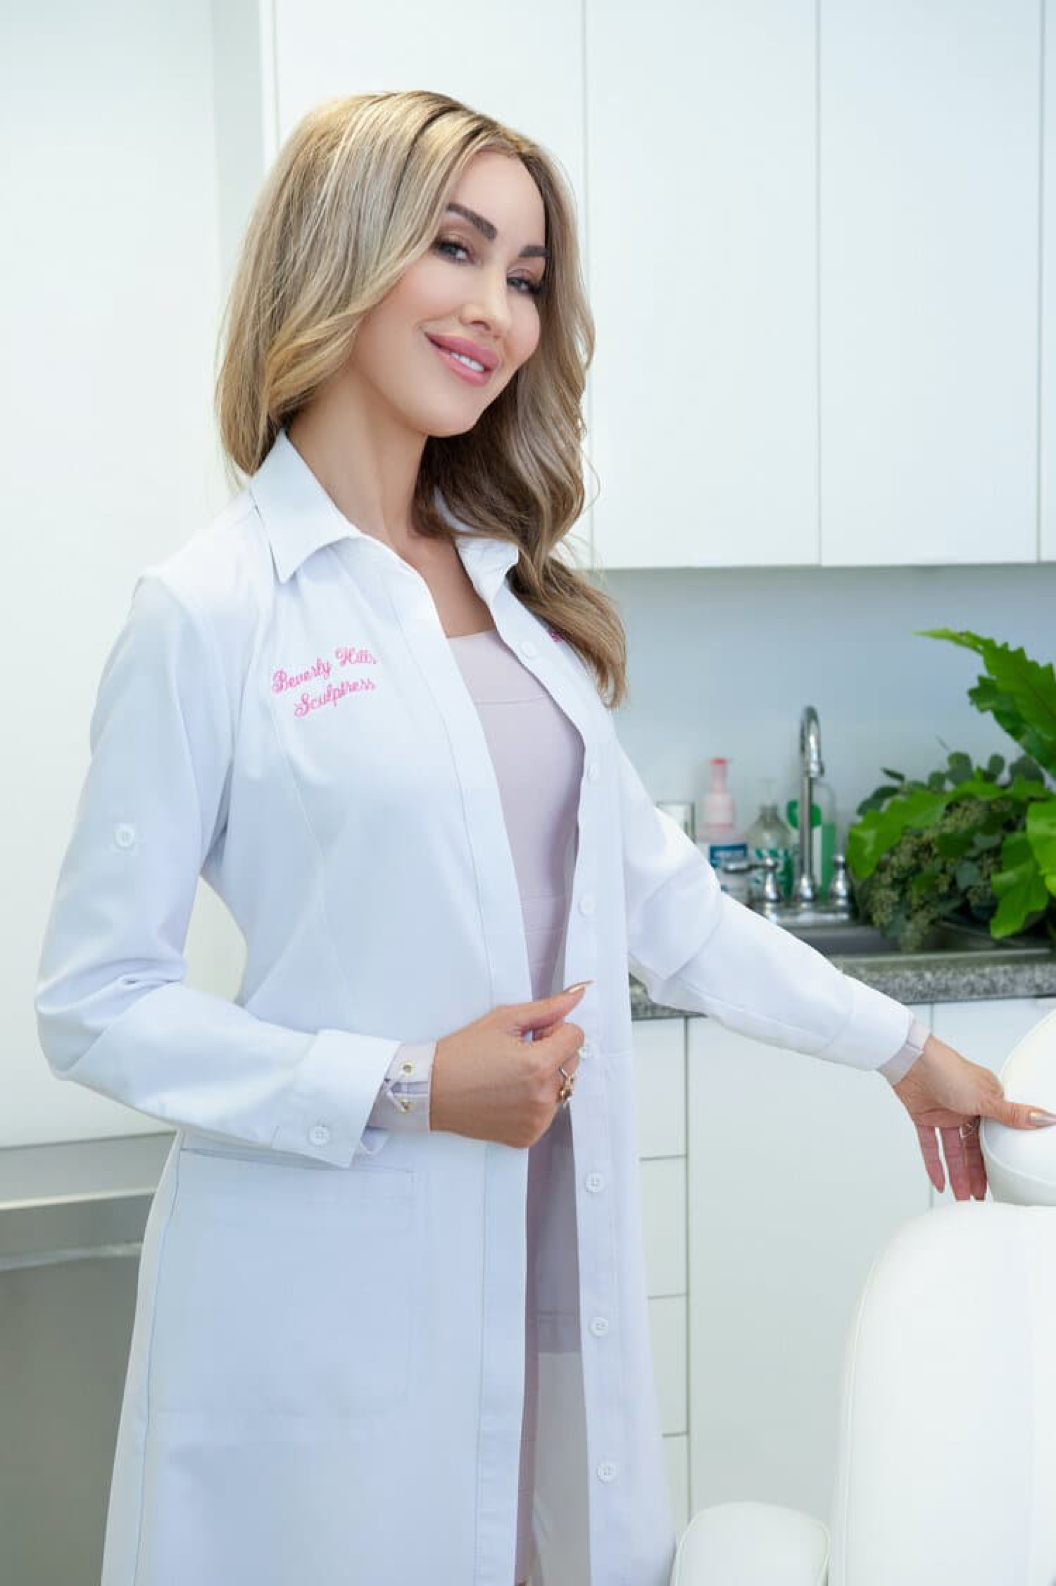 Shea with Medical Uniform